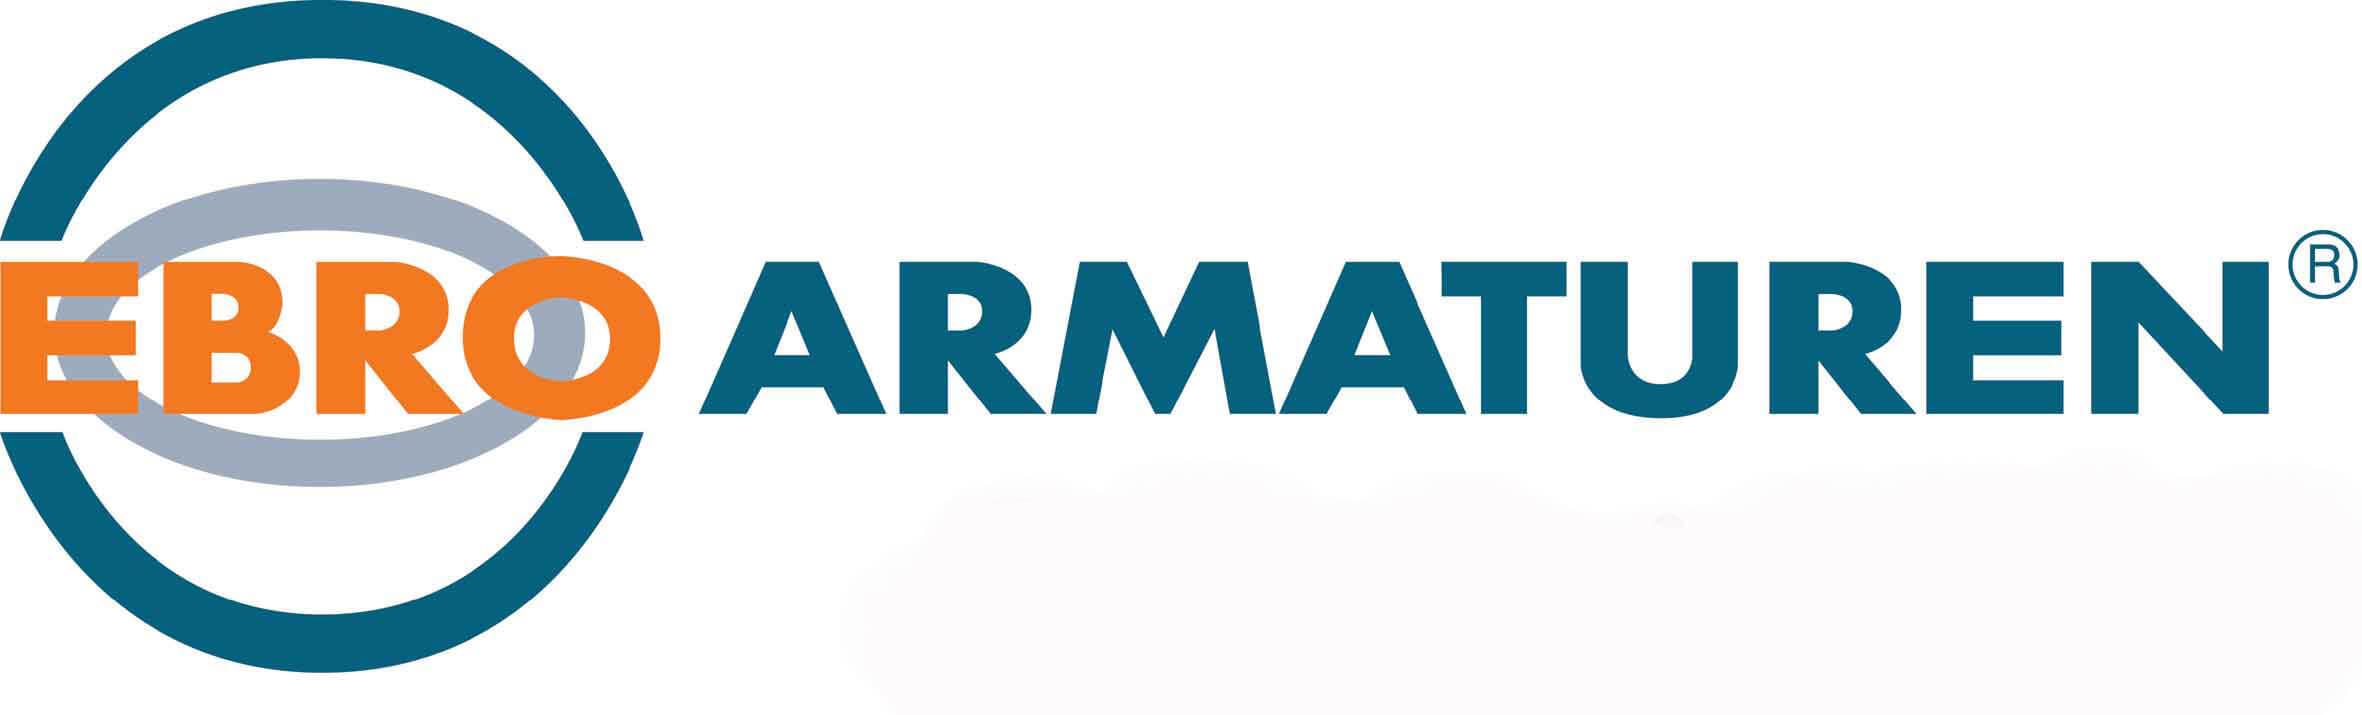 Image result for ebro armaturen